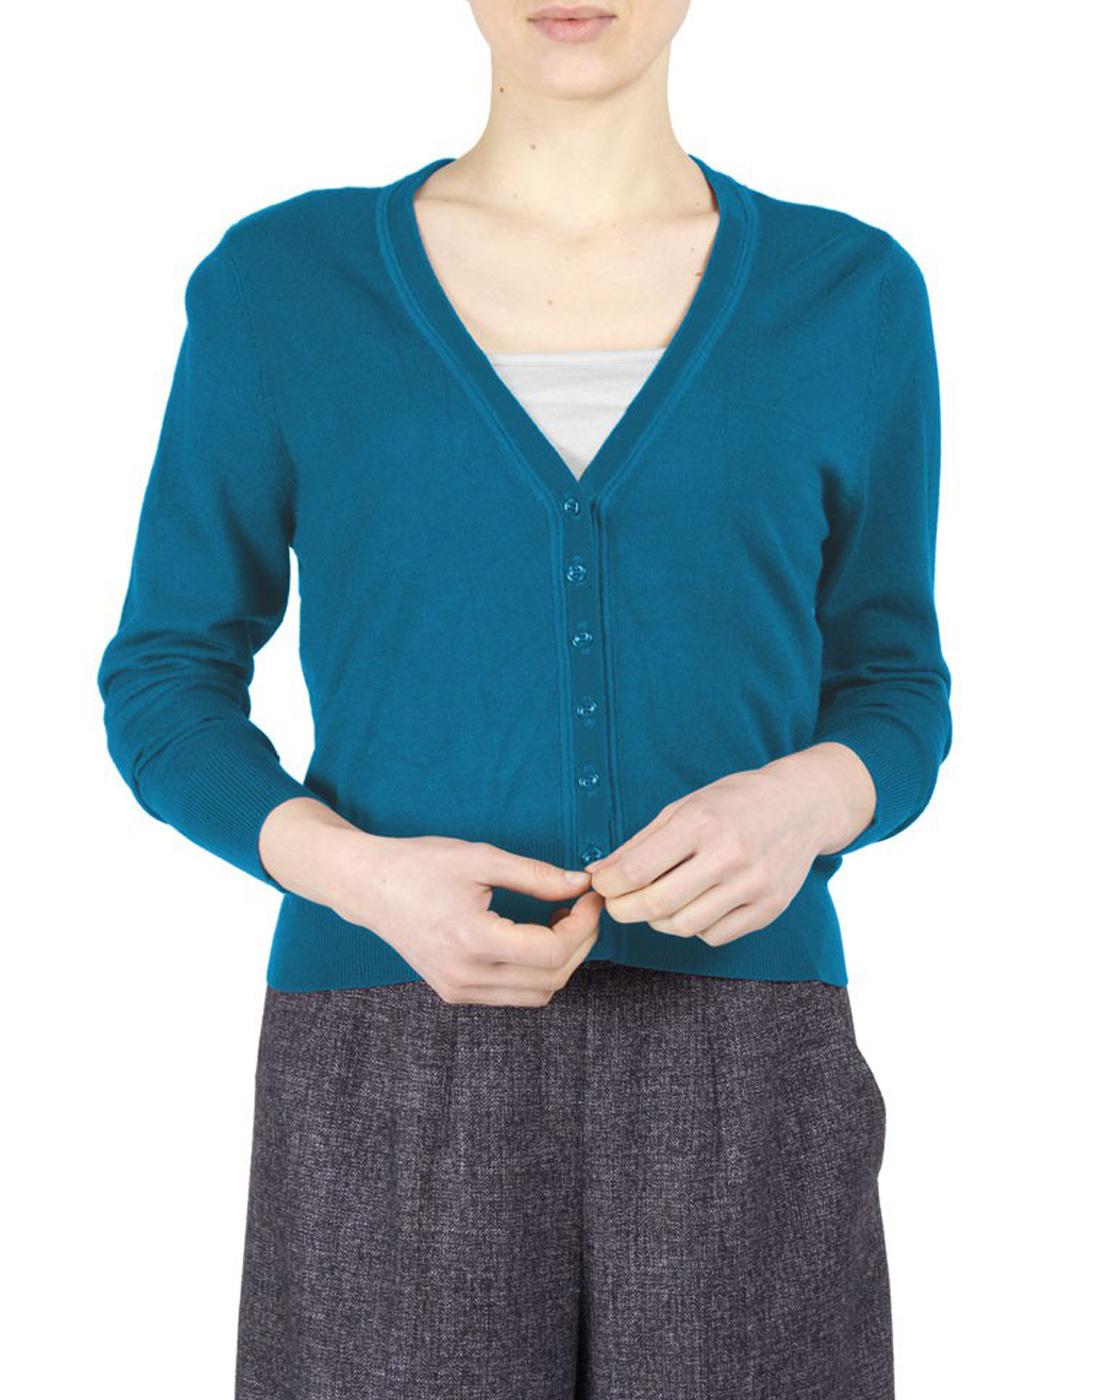 Melanie FEVER Retro Sixties Plain Knitted Cardigan